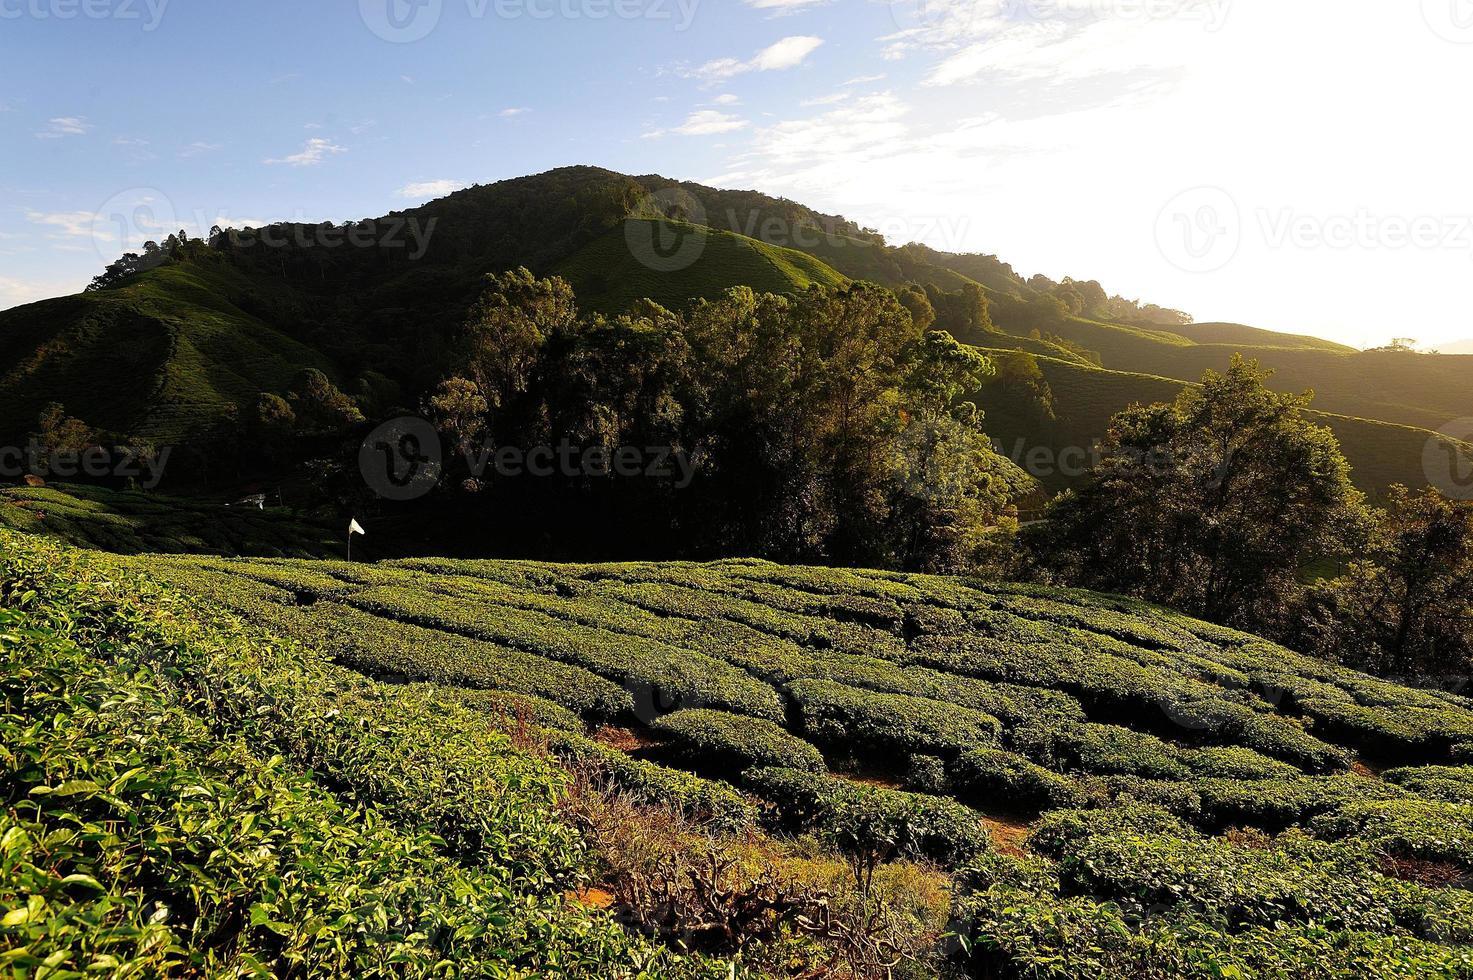 Tea Plantation Fields on the Hills photo